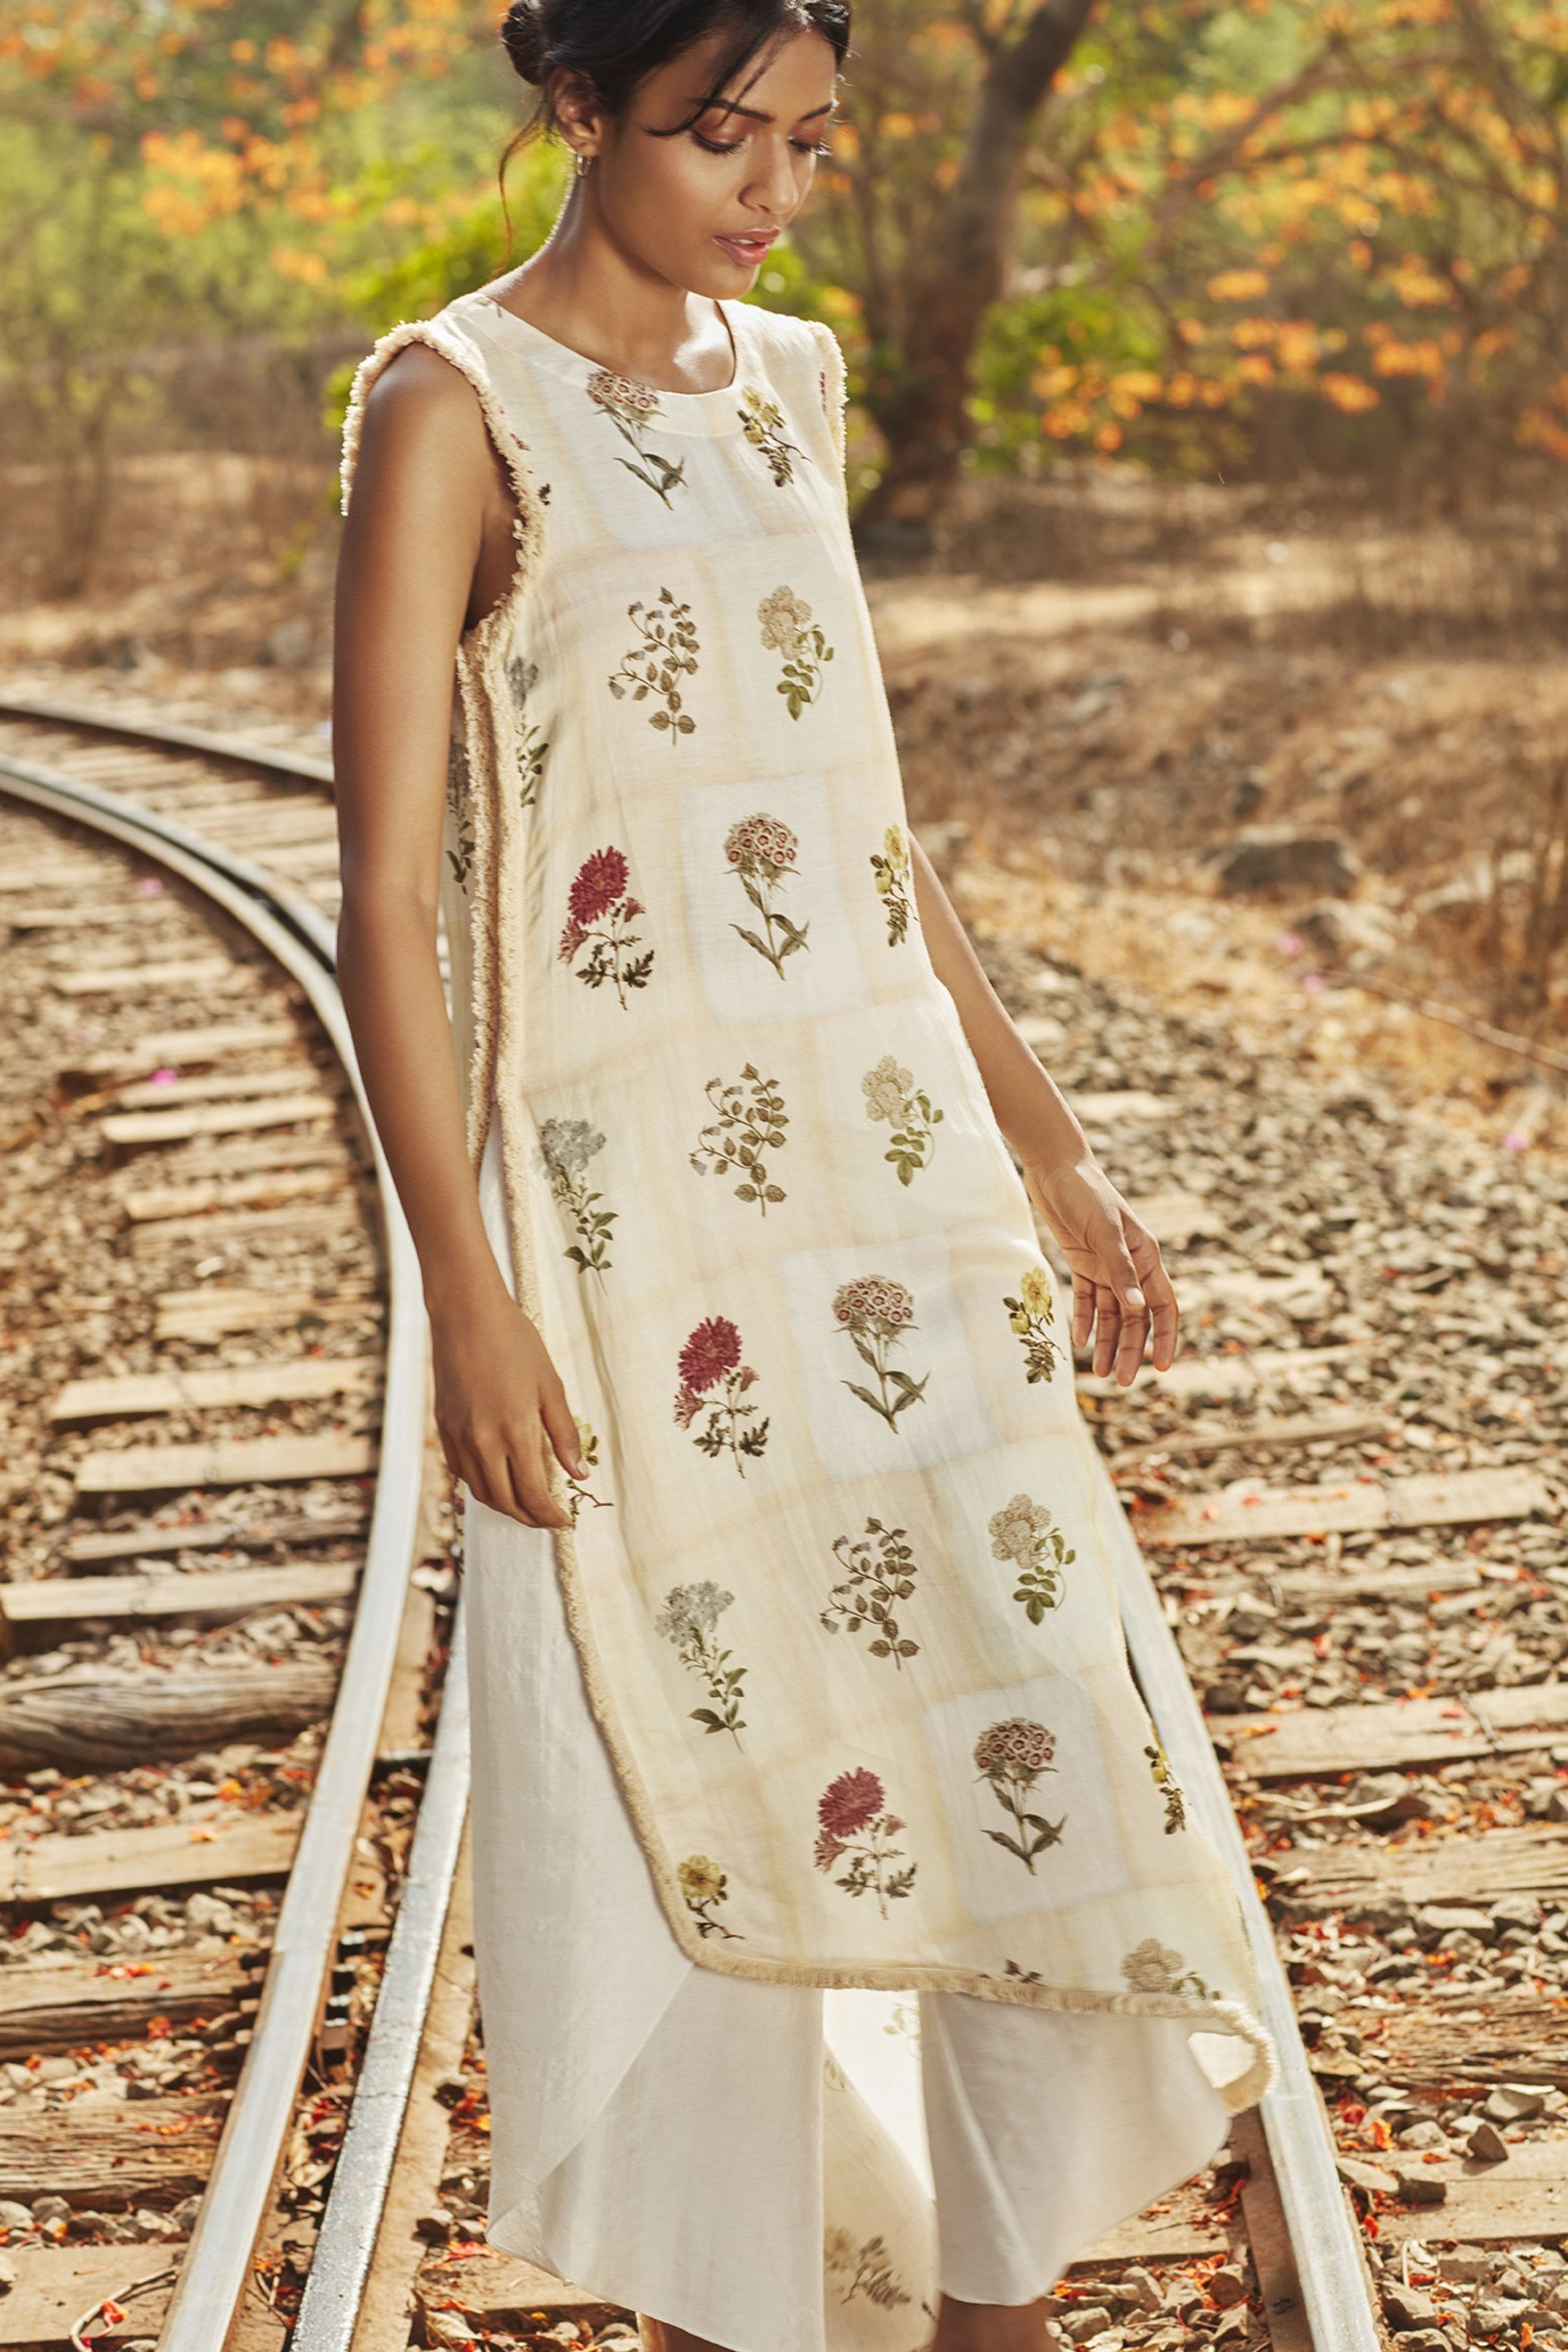 5 Things you can gift your sibling this Raksha Bandhan